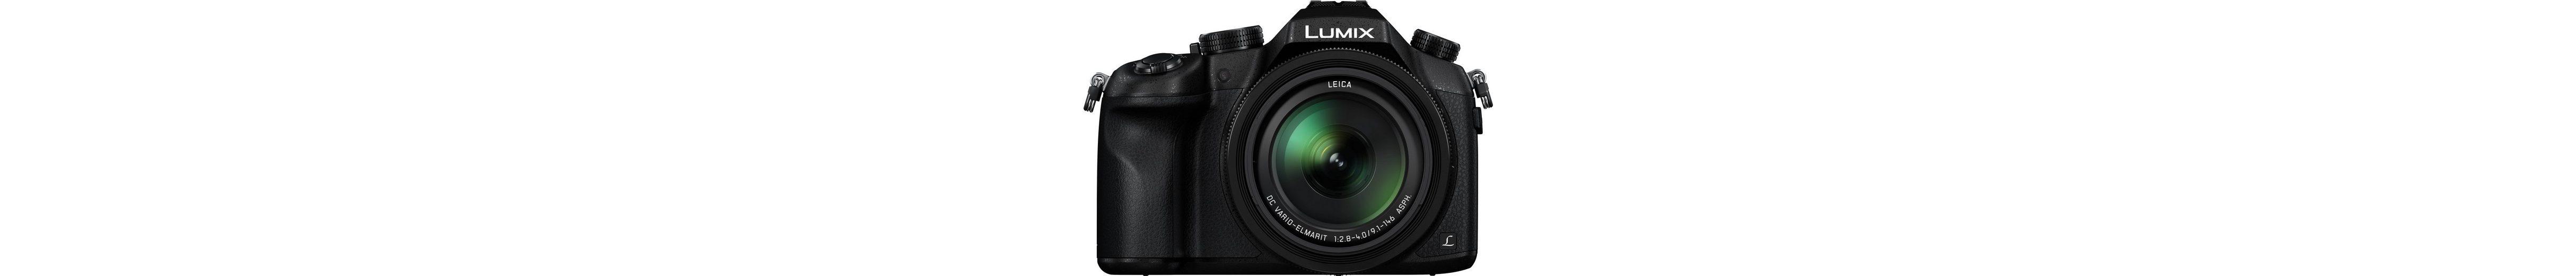 Lumix Panasonic LUMIX DMC-FZ1000 Super Zoom Kamera, 20,1 Megapixel, 16x opt. Zoom